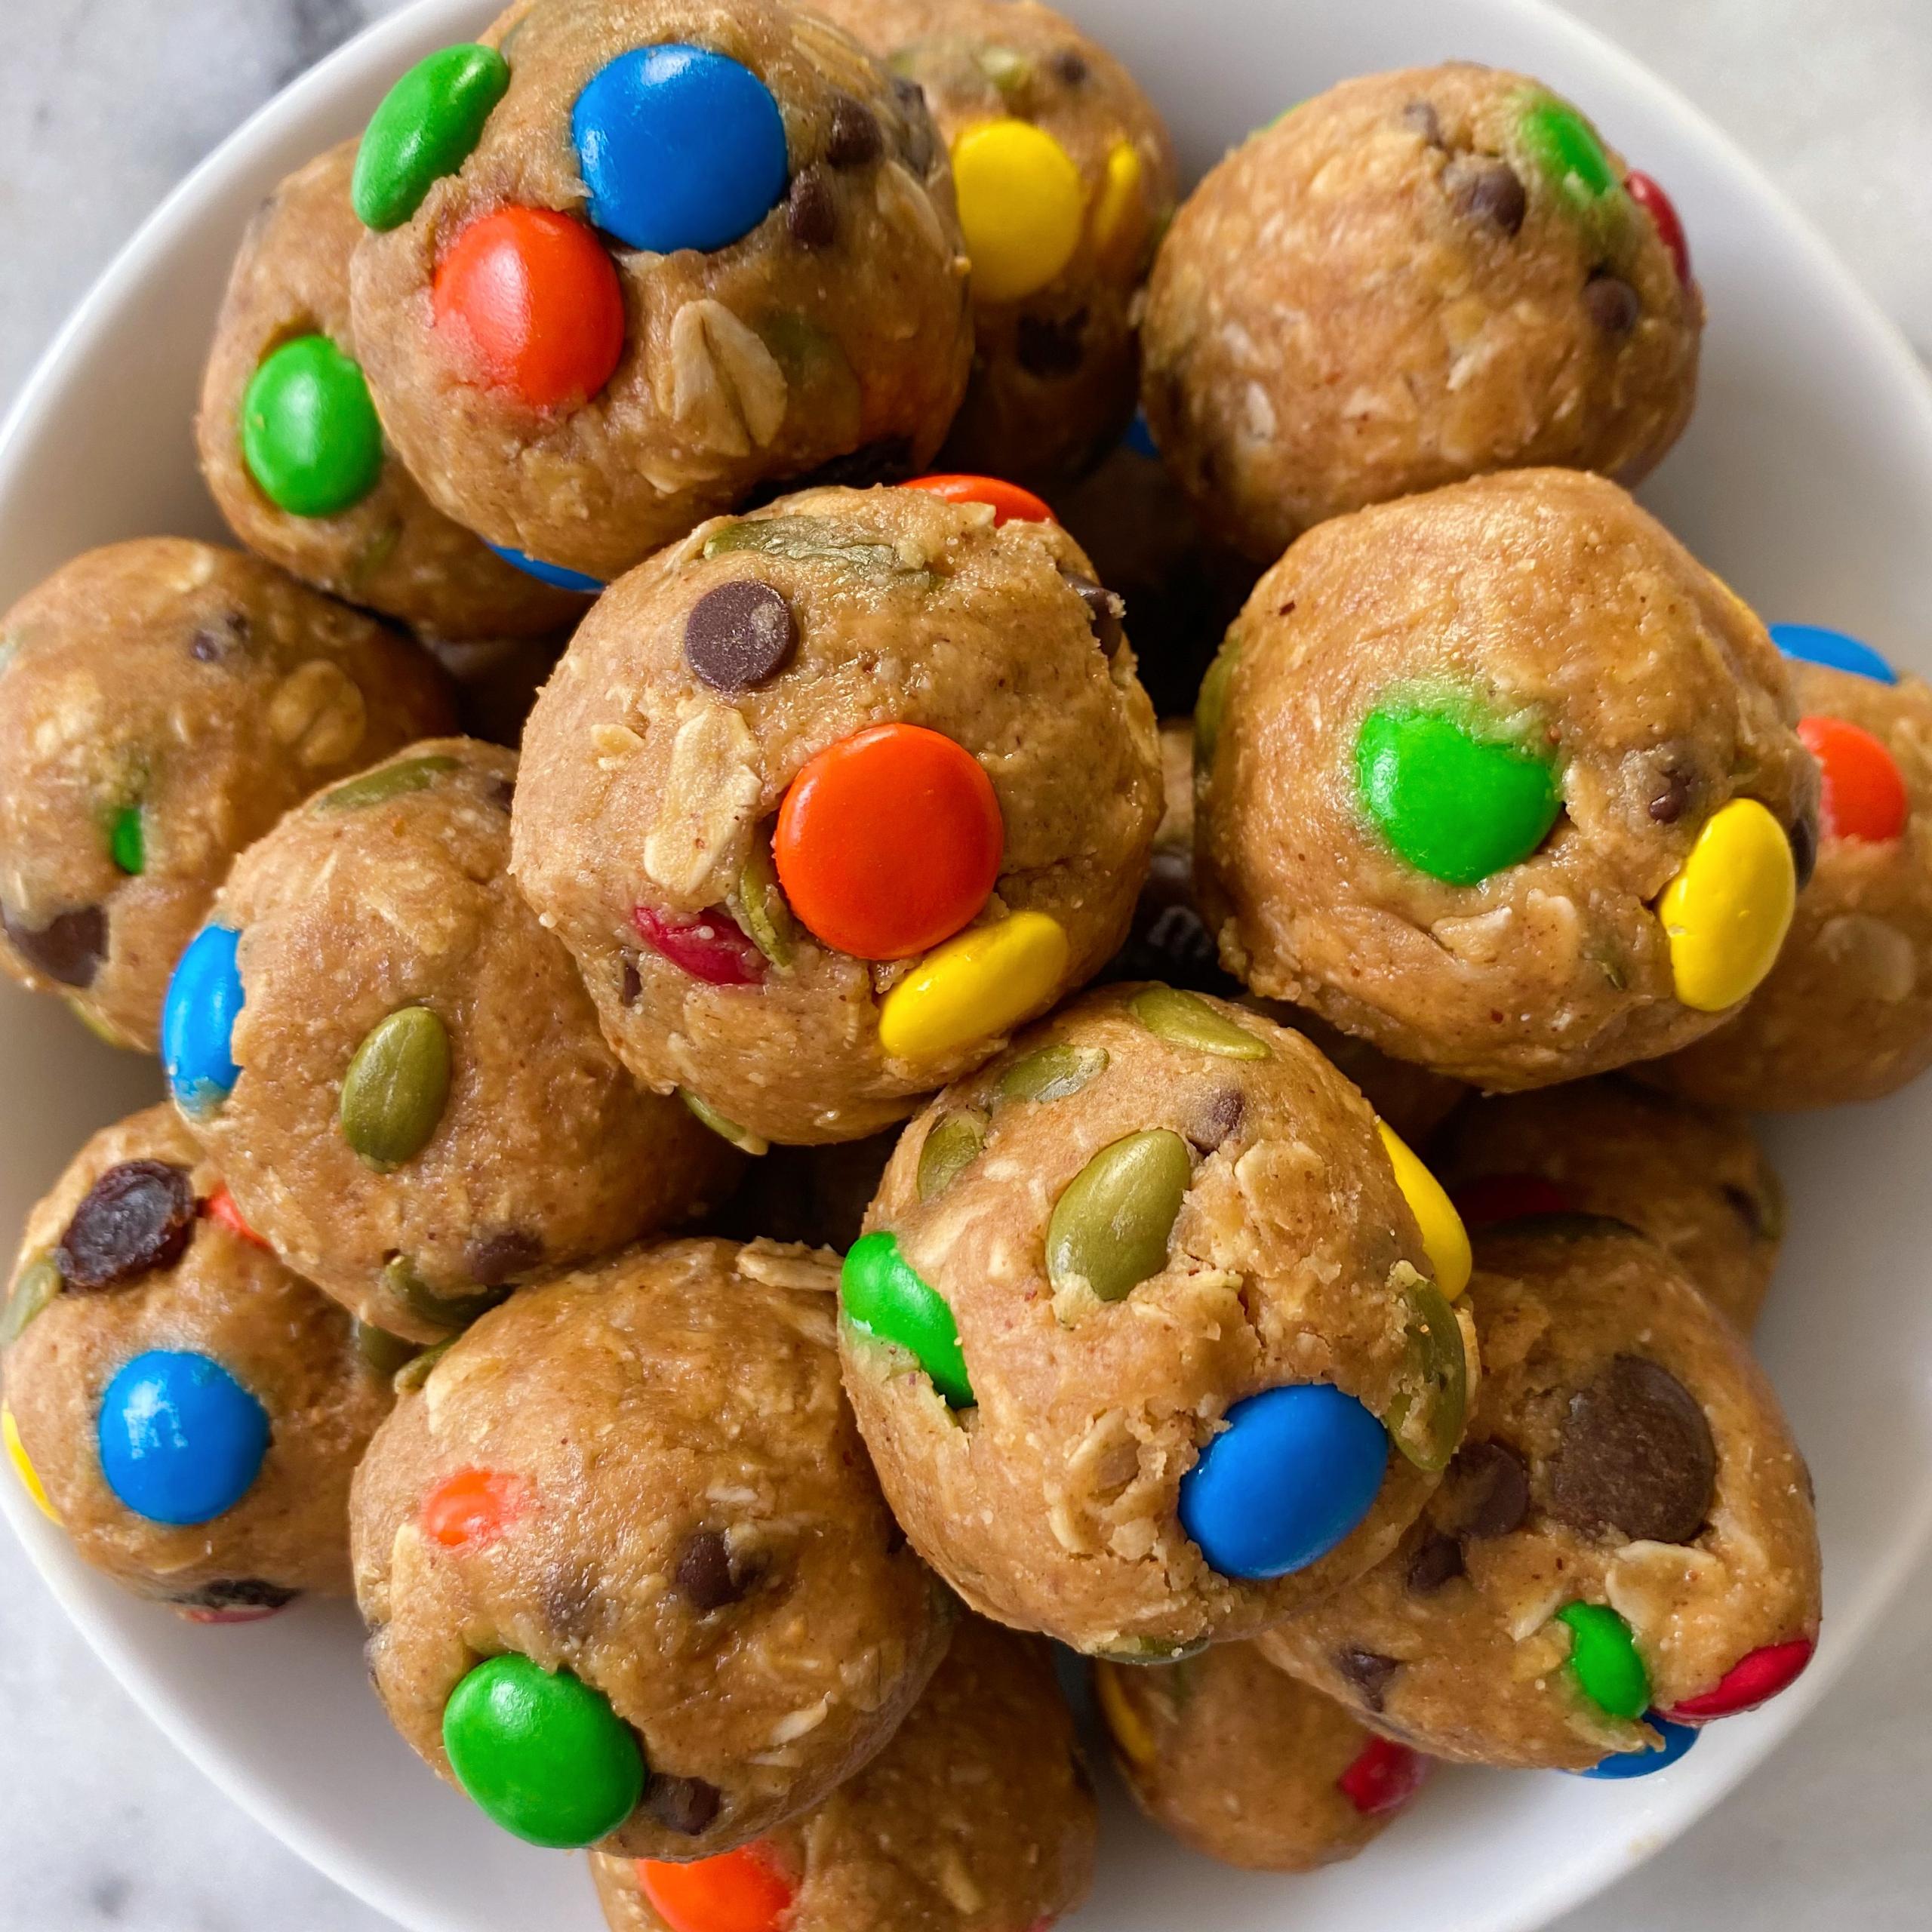 No Bake Monster Cookie Bites gluten free www.healthygffamily.com